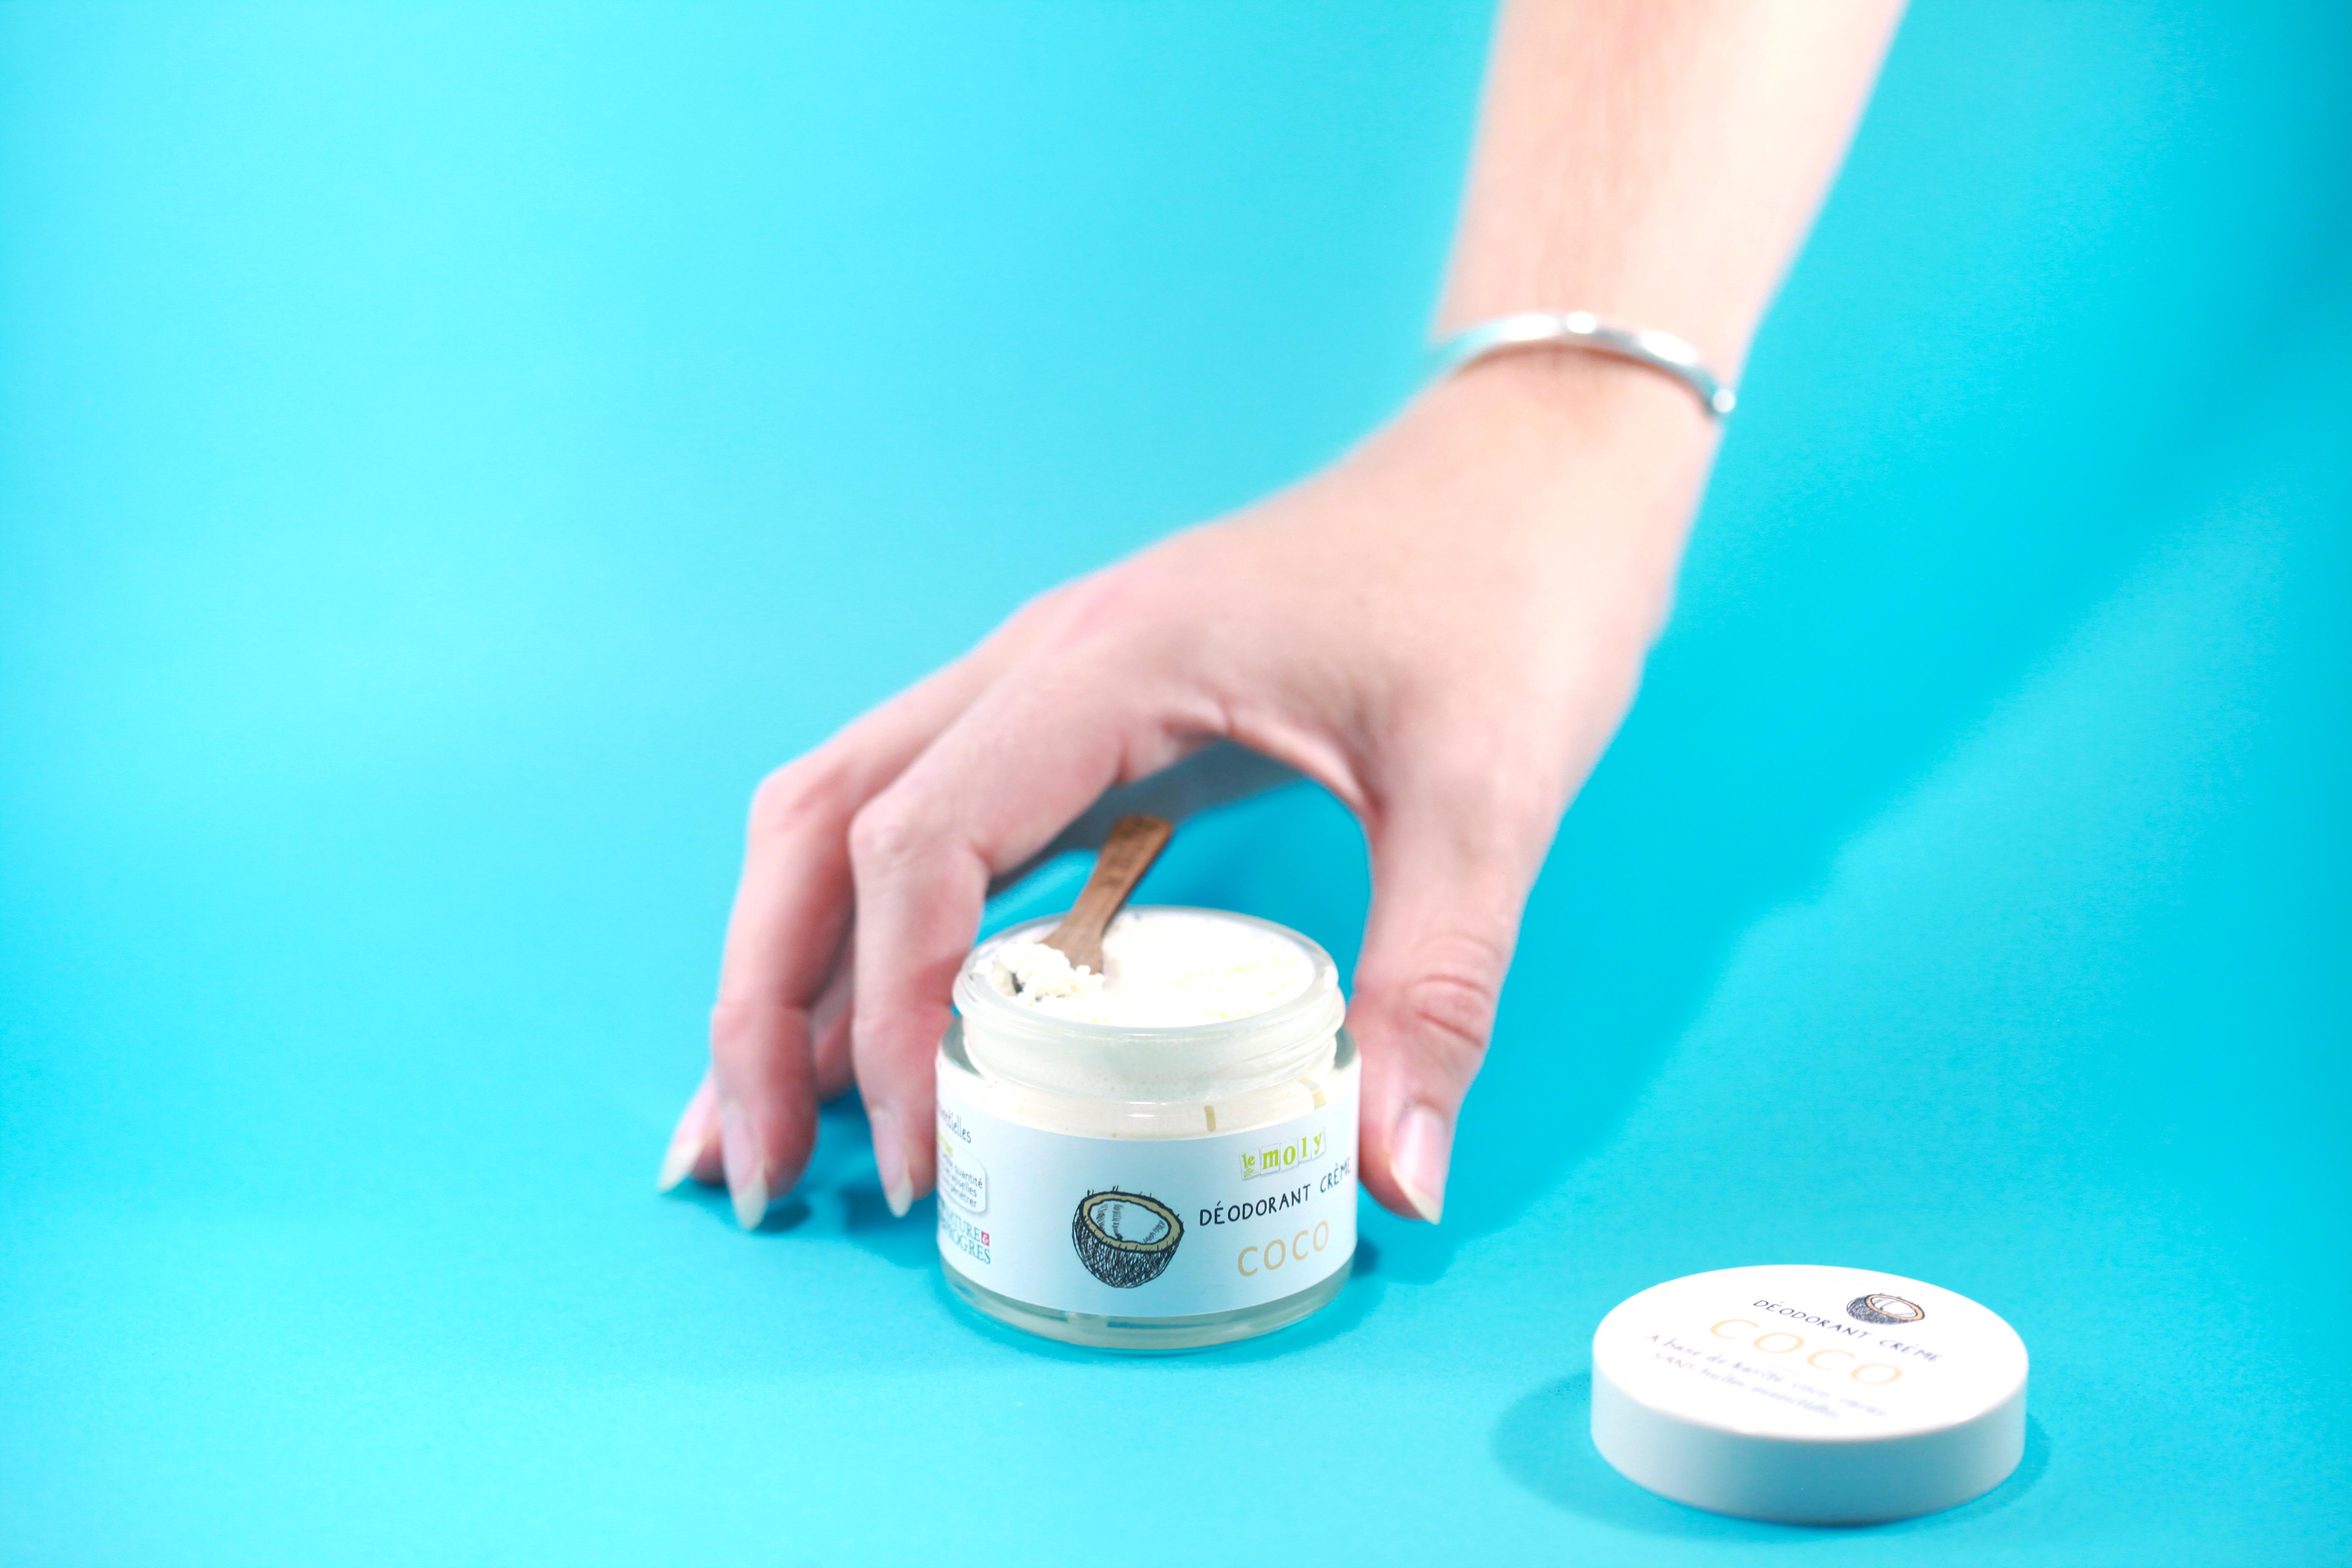 Déodorant coco Le Moly